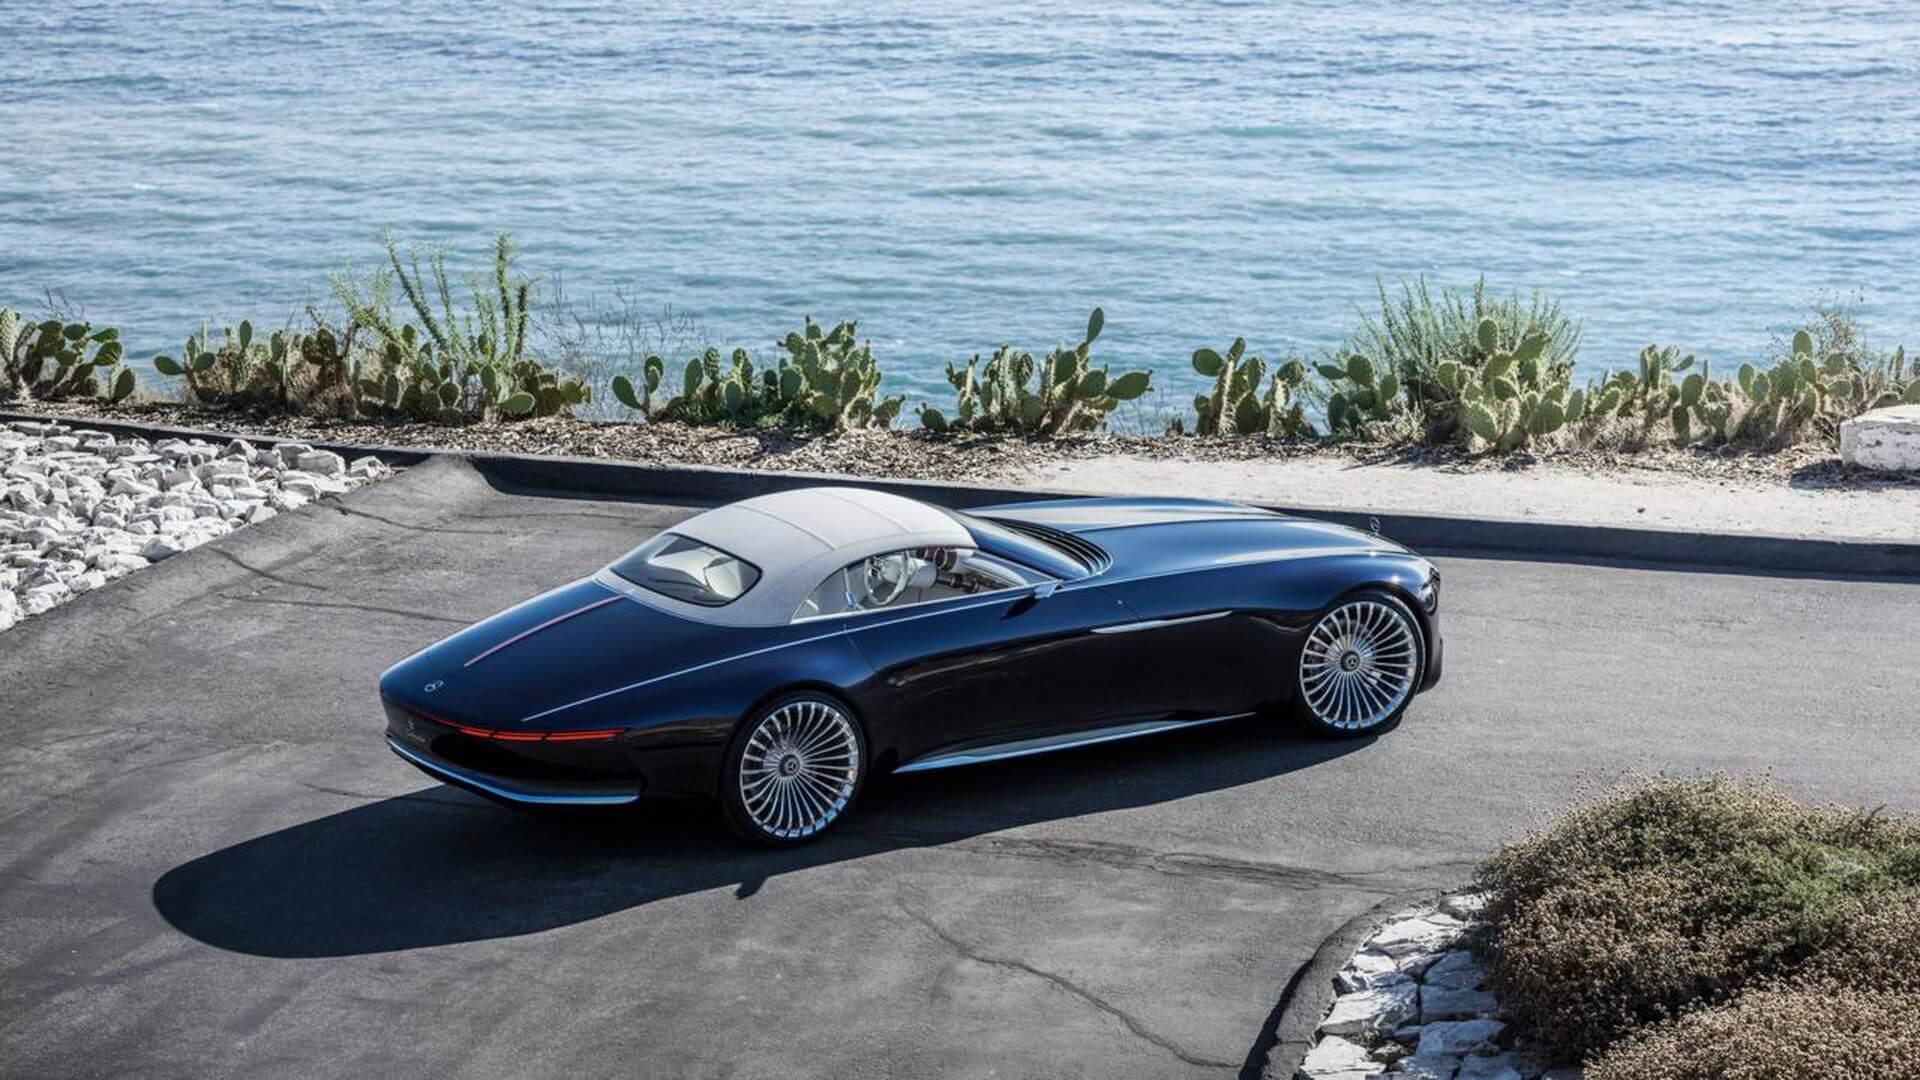 Двухместный электромобиль Vision Mercedes-Maybach 6 Cabriolet